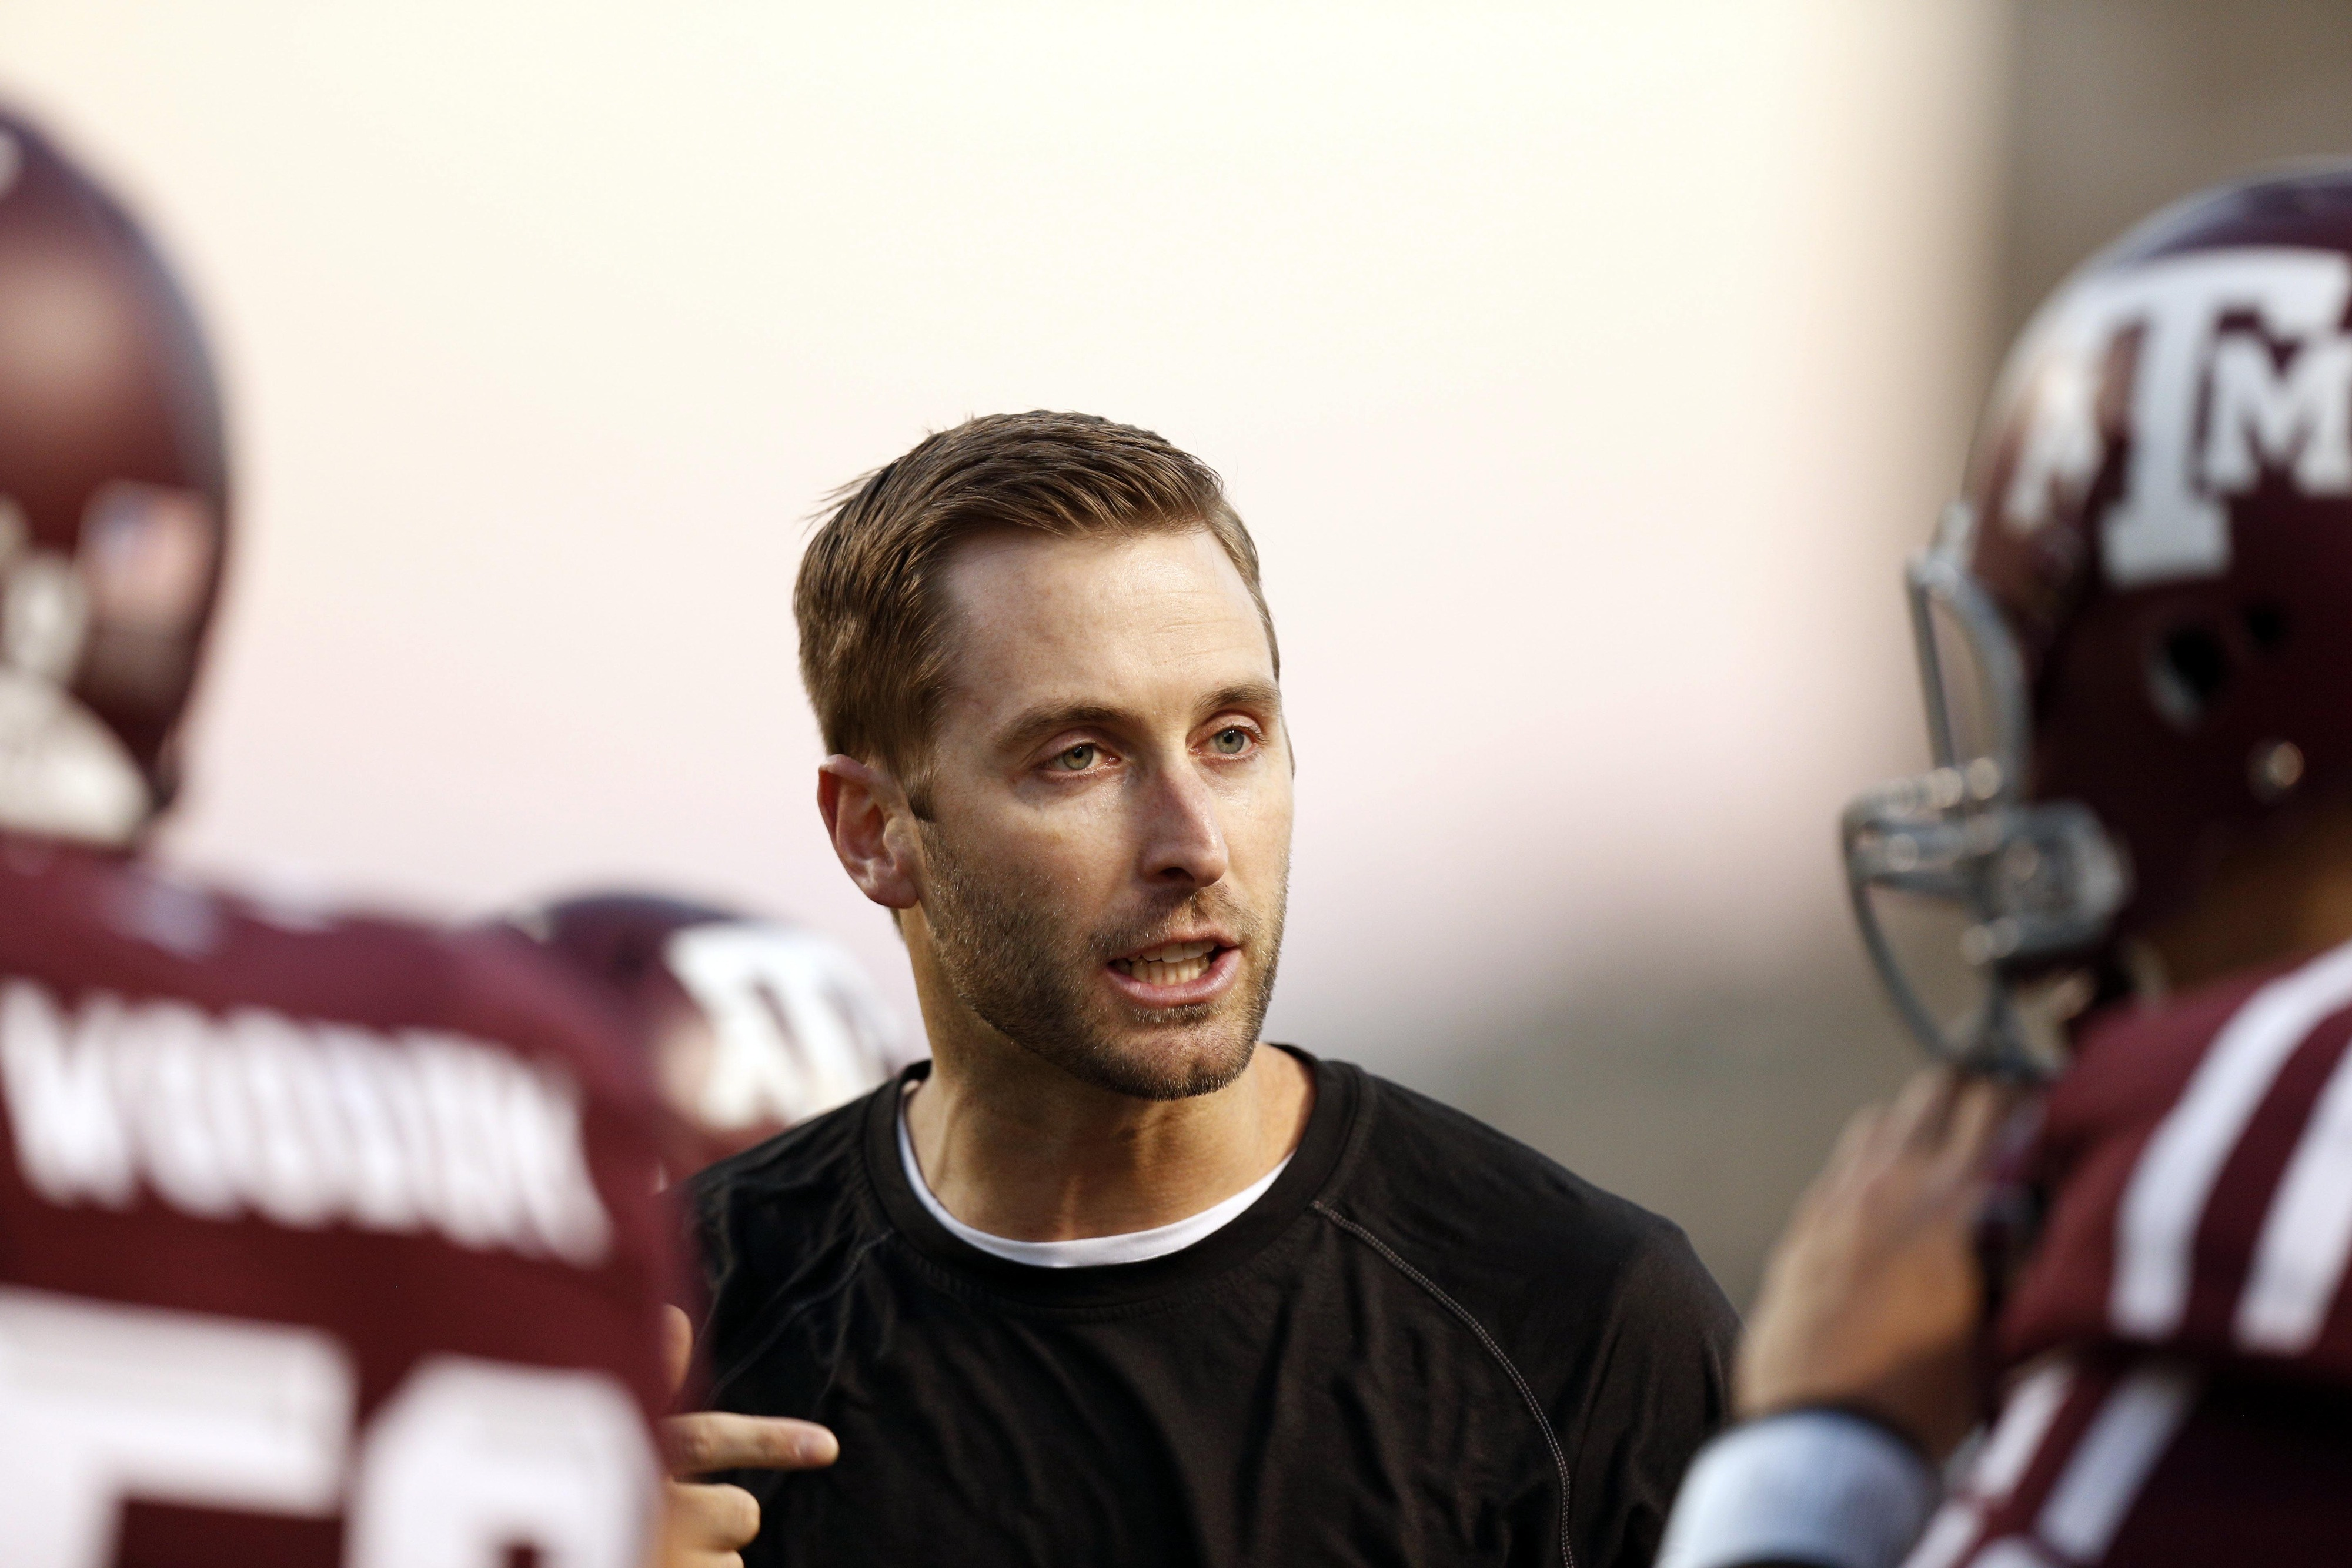 Kliff Kingsbury - Texas Tech head coach and Bradley Cooper/Ryan Gosling's lovechild.